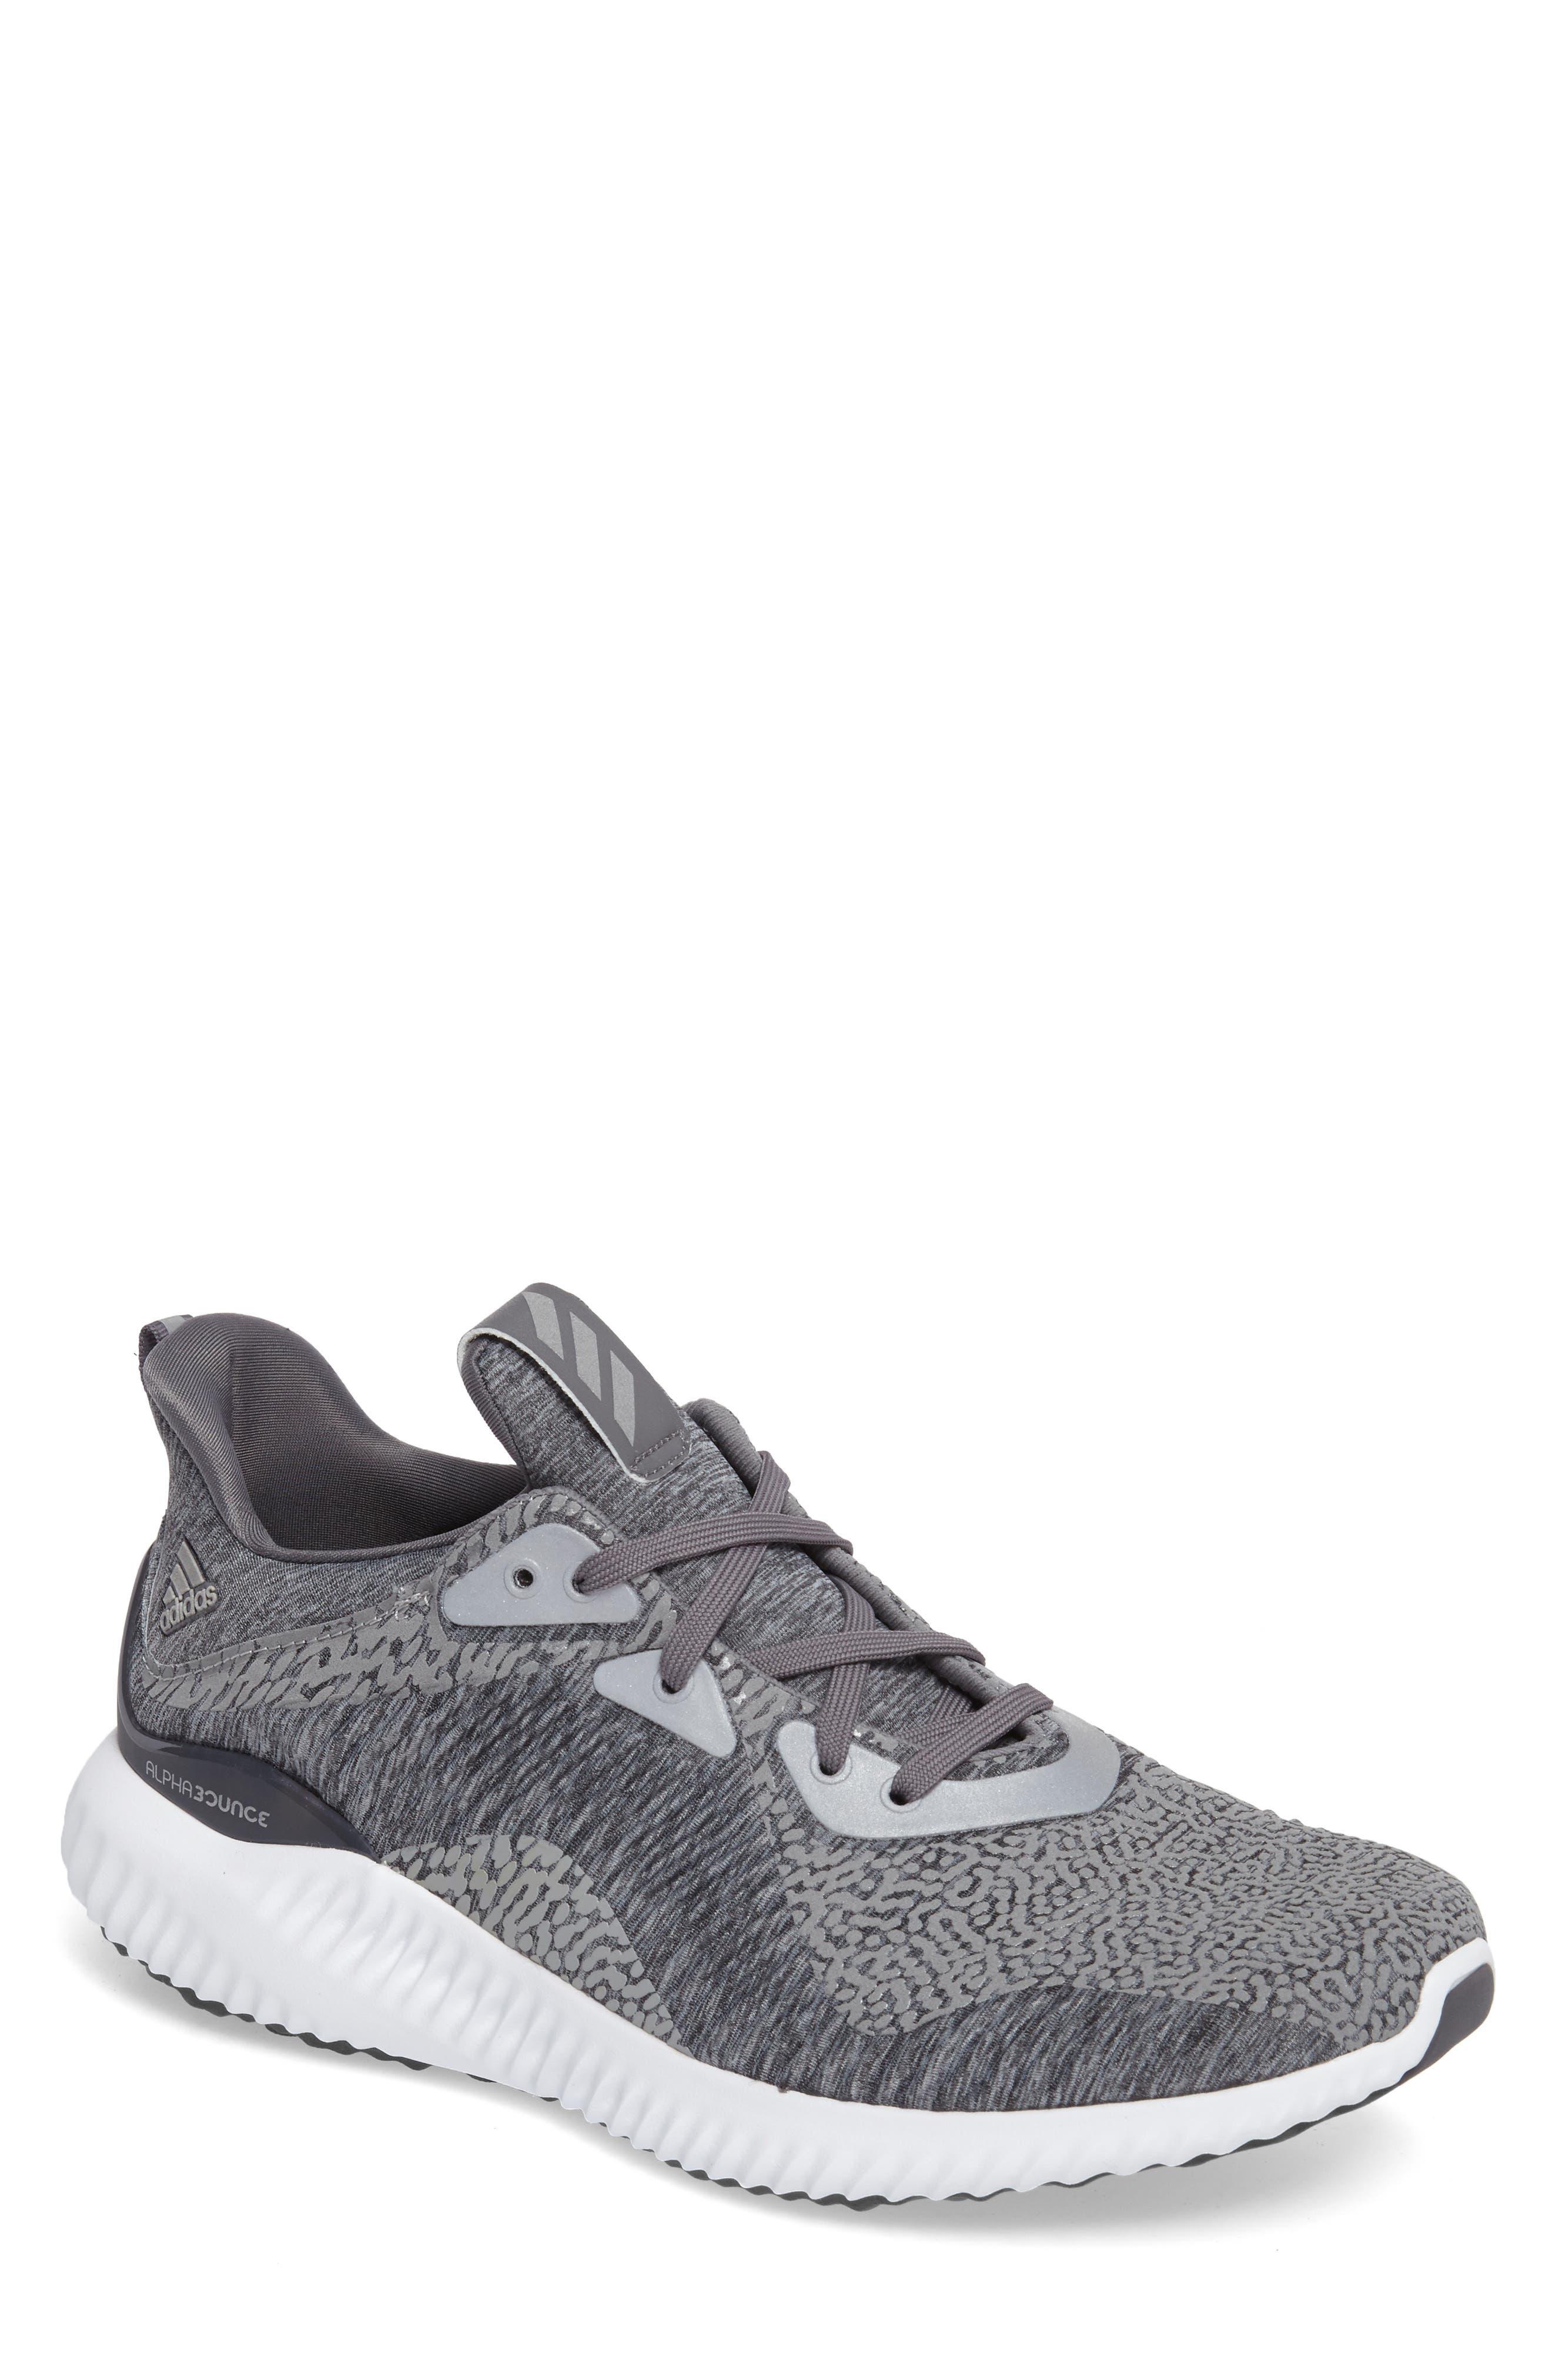 Main Image - adidas AlphaBounce Aramis Sneaker (Men)